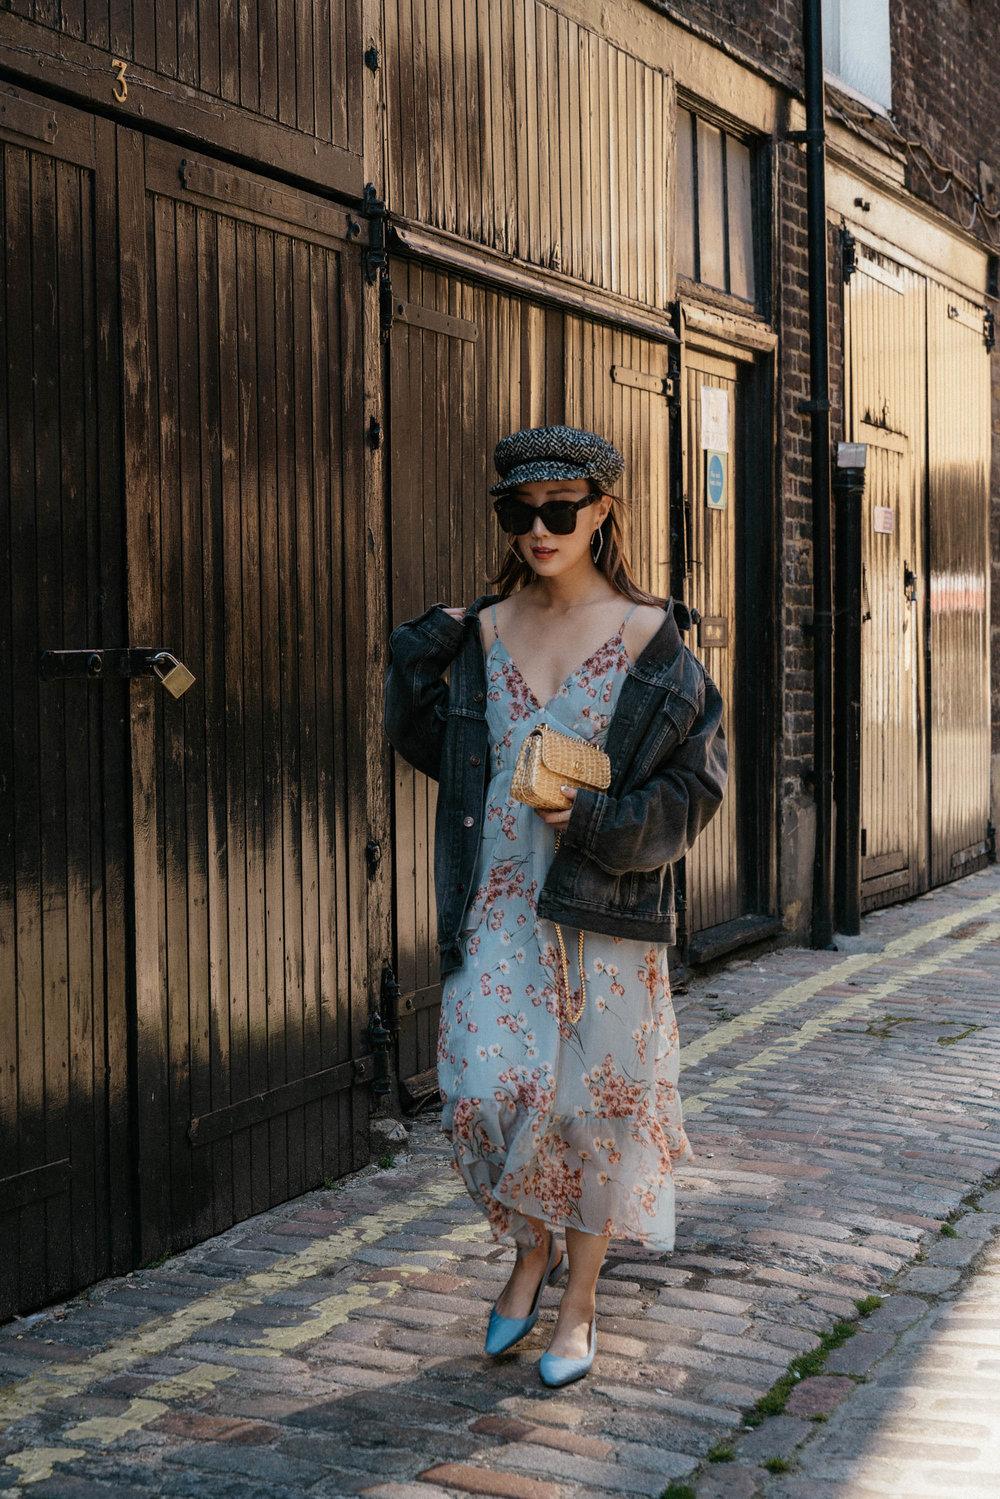 Balenciaga Jacket,  FiveSeventyFive Dress ,  Seven All Around Shoes , Eugenia Kim Hat, Gucci Bag, Celine Sunglasses